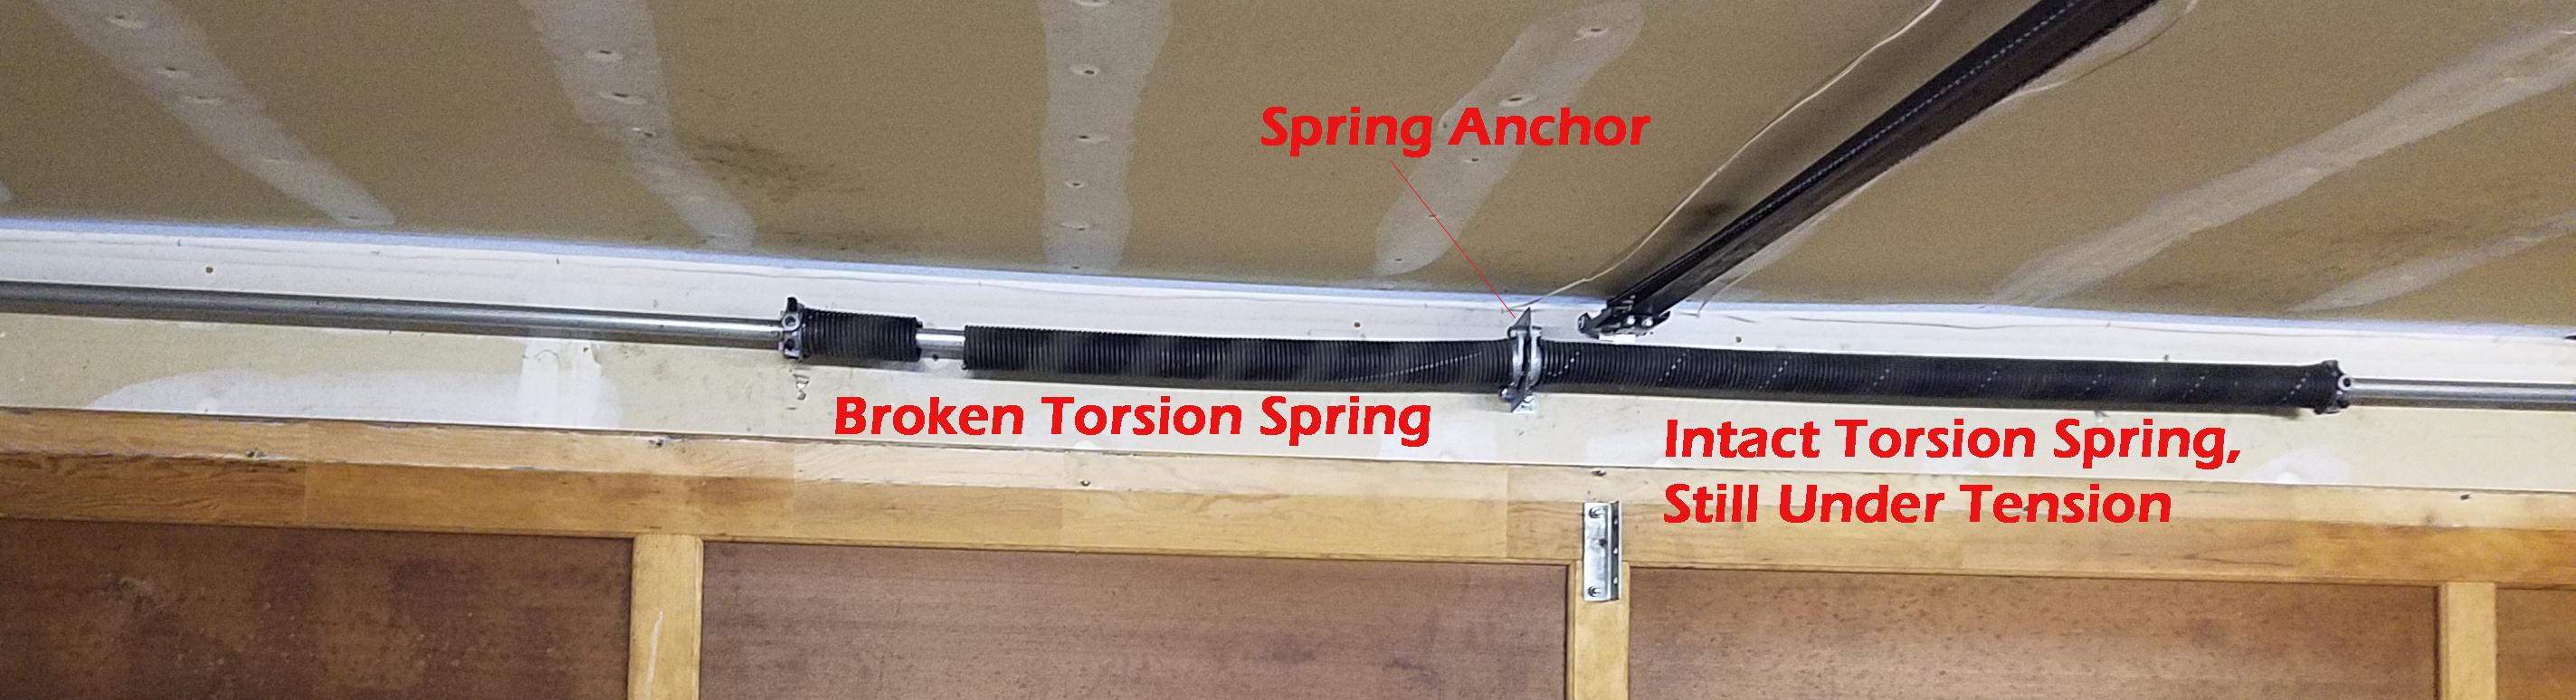 broken torsion sring diagram